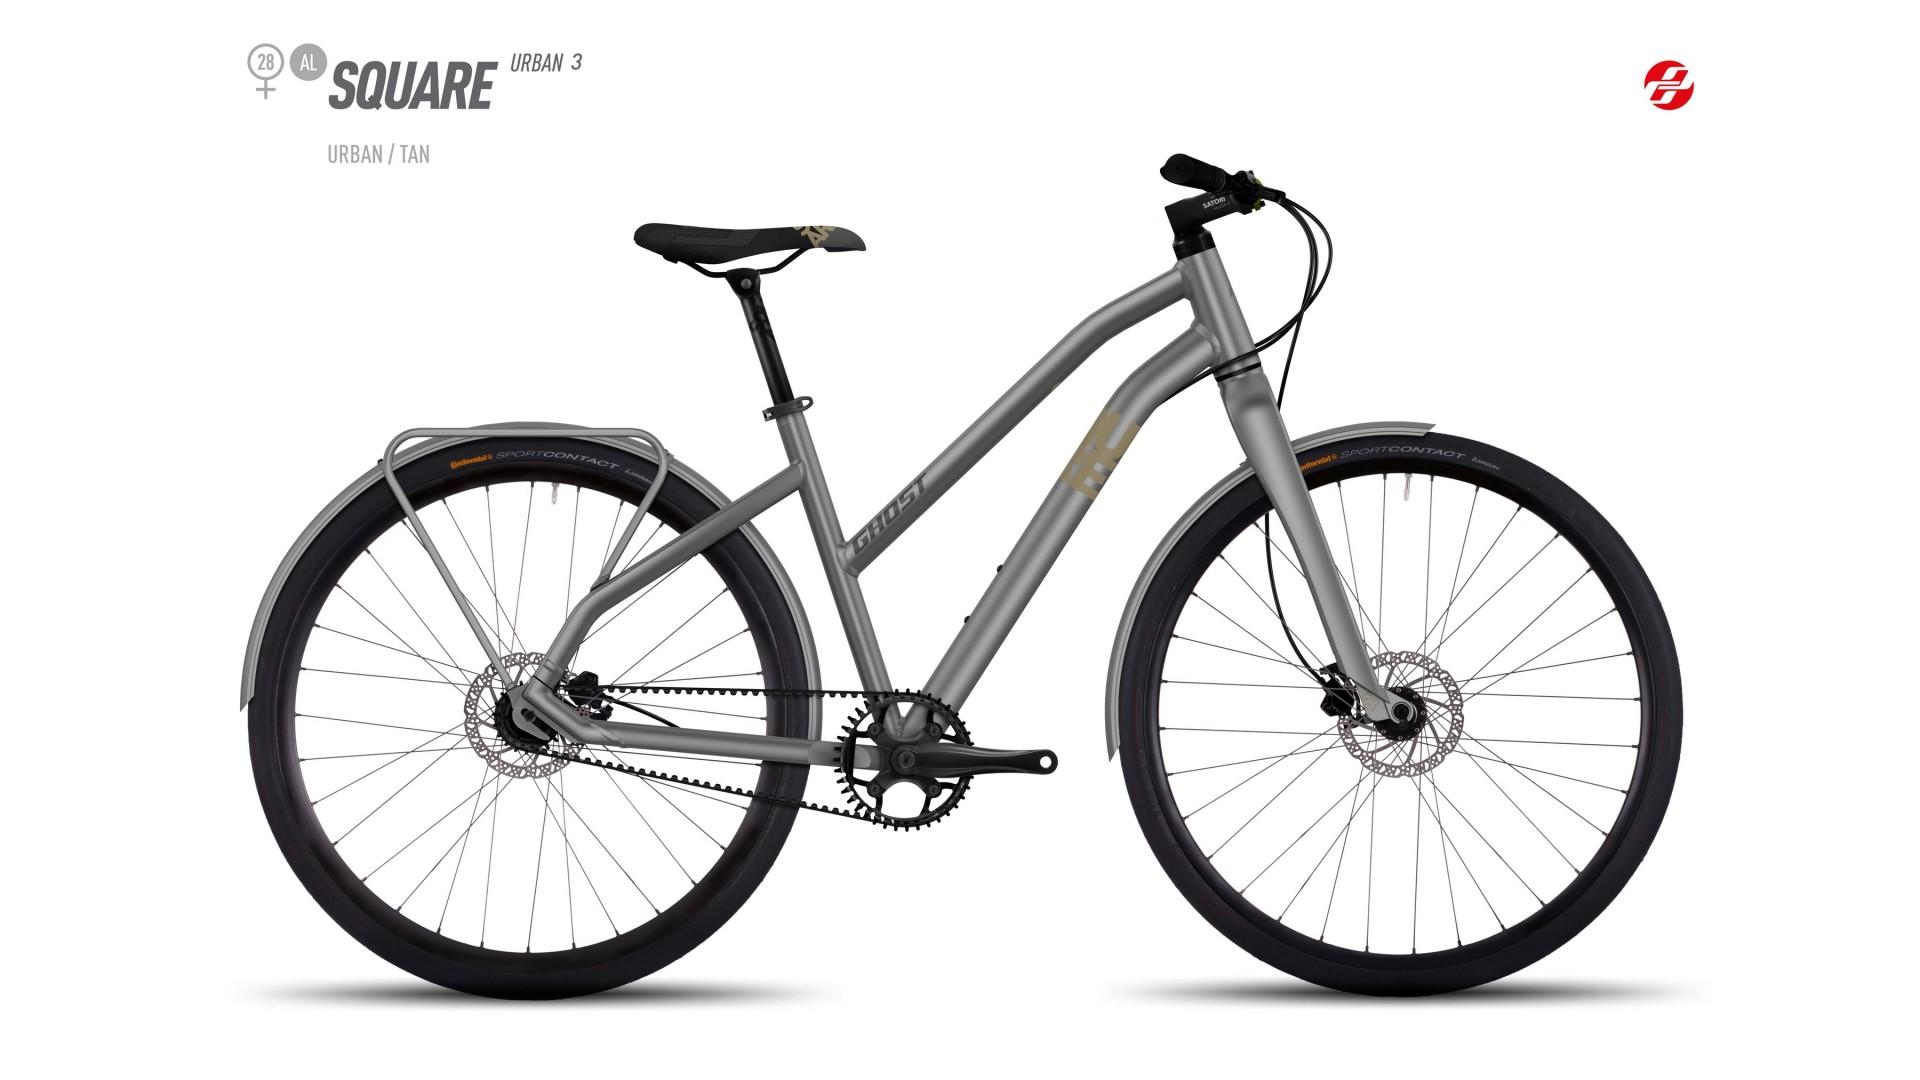 Велосипед GHOST SQUARE Urban 3 AL W 28 urban/tan/nightblack год 2017